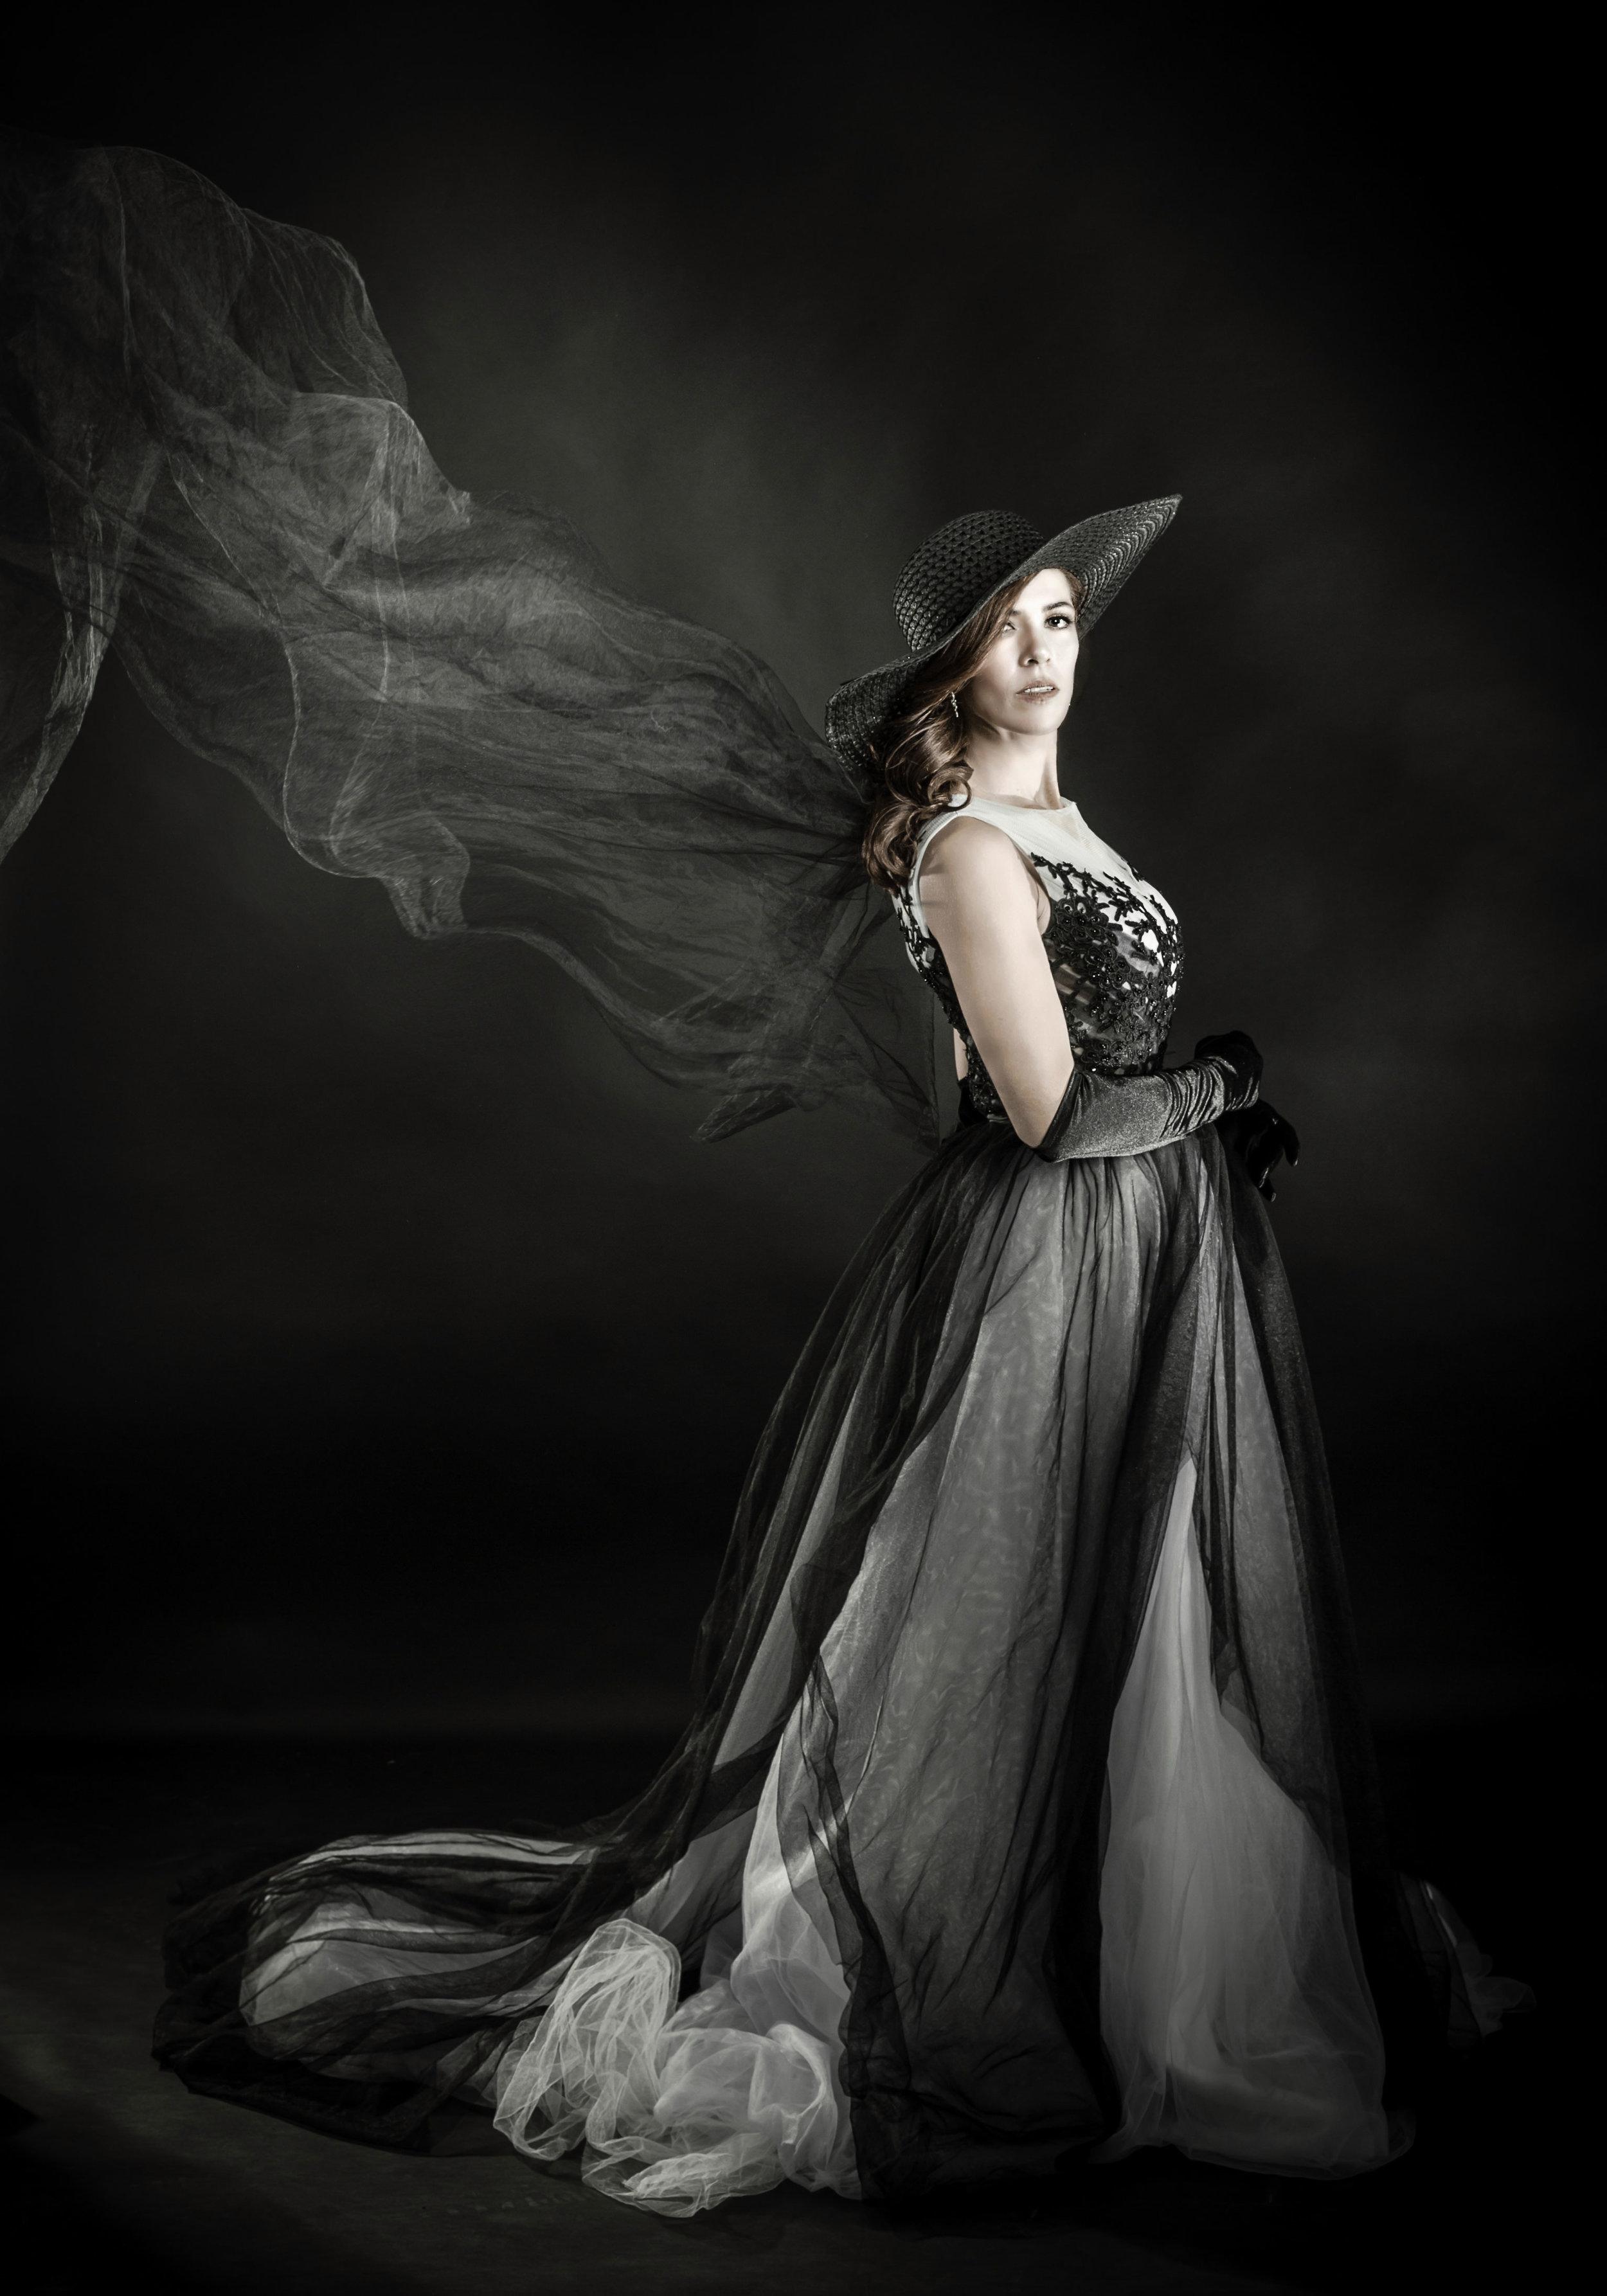 best-portrait-photographer-colorado-springs-0145.jpg